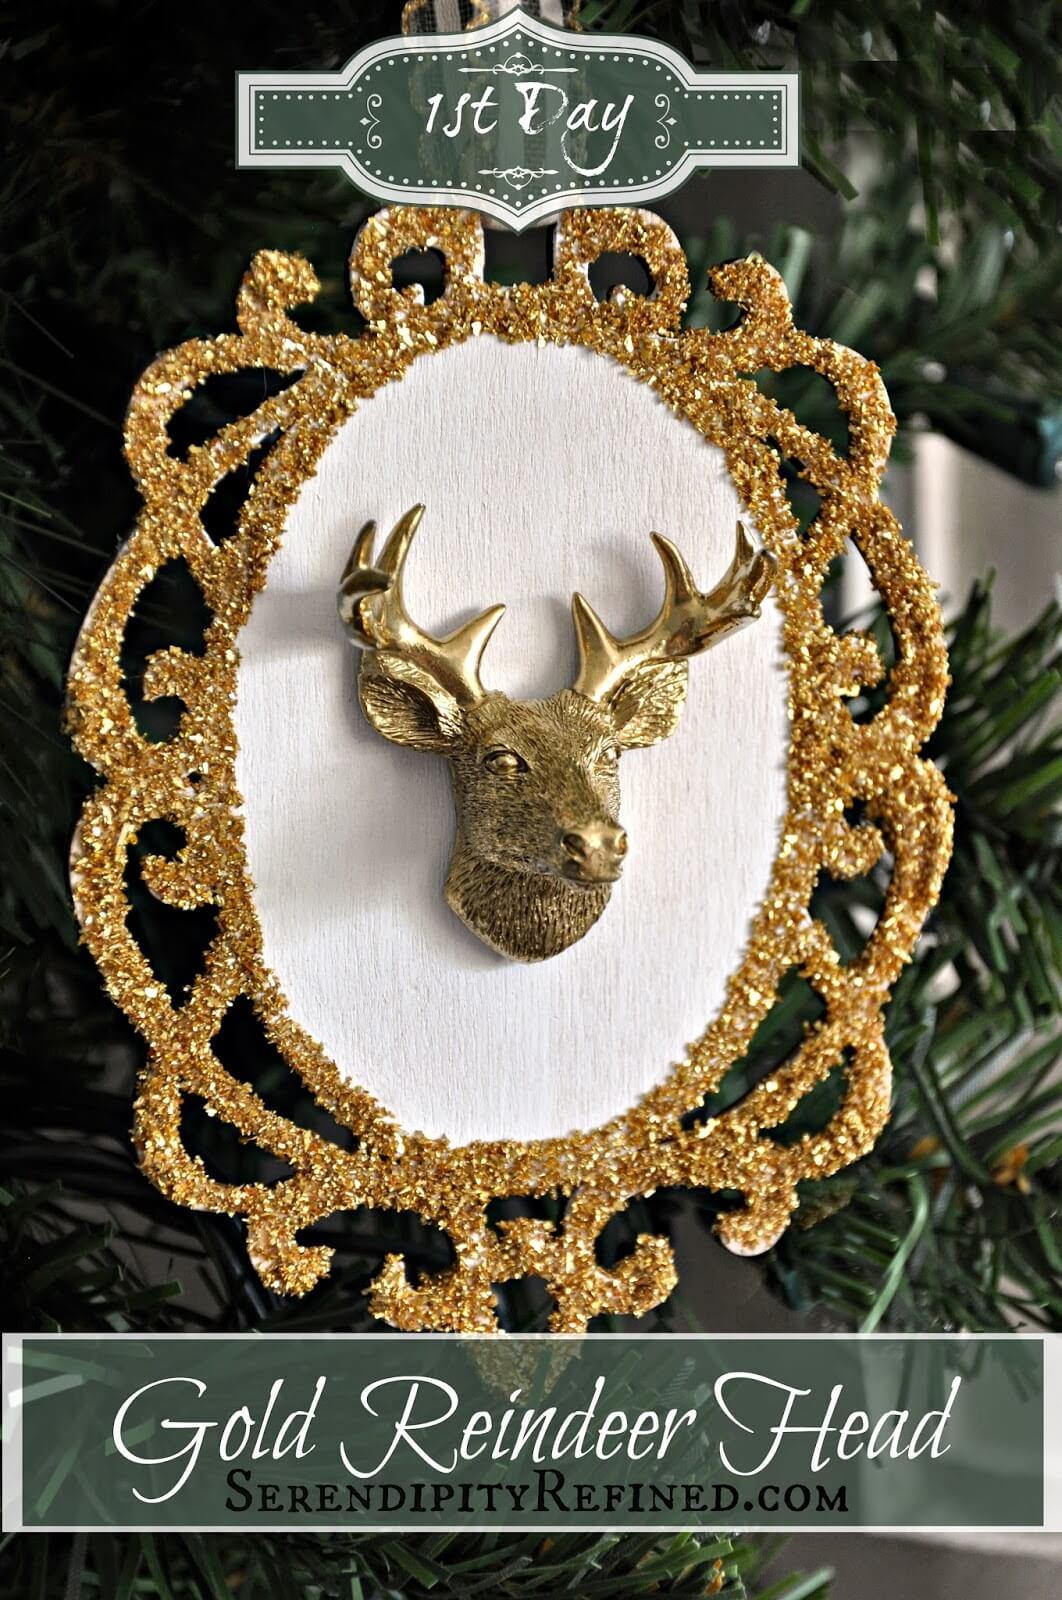 Gilded Reindeer Head